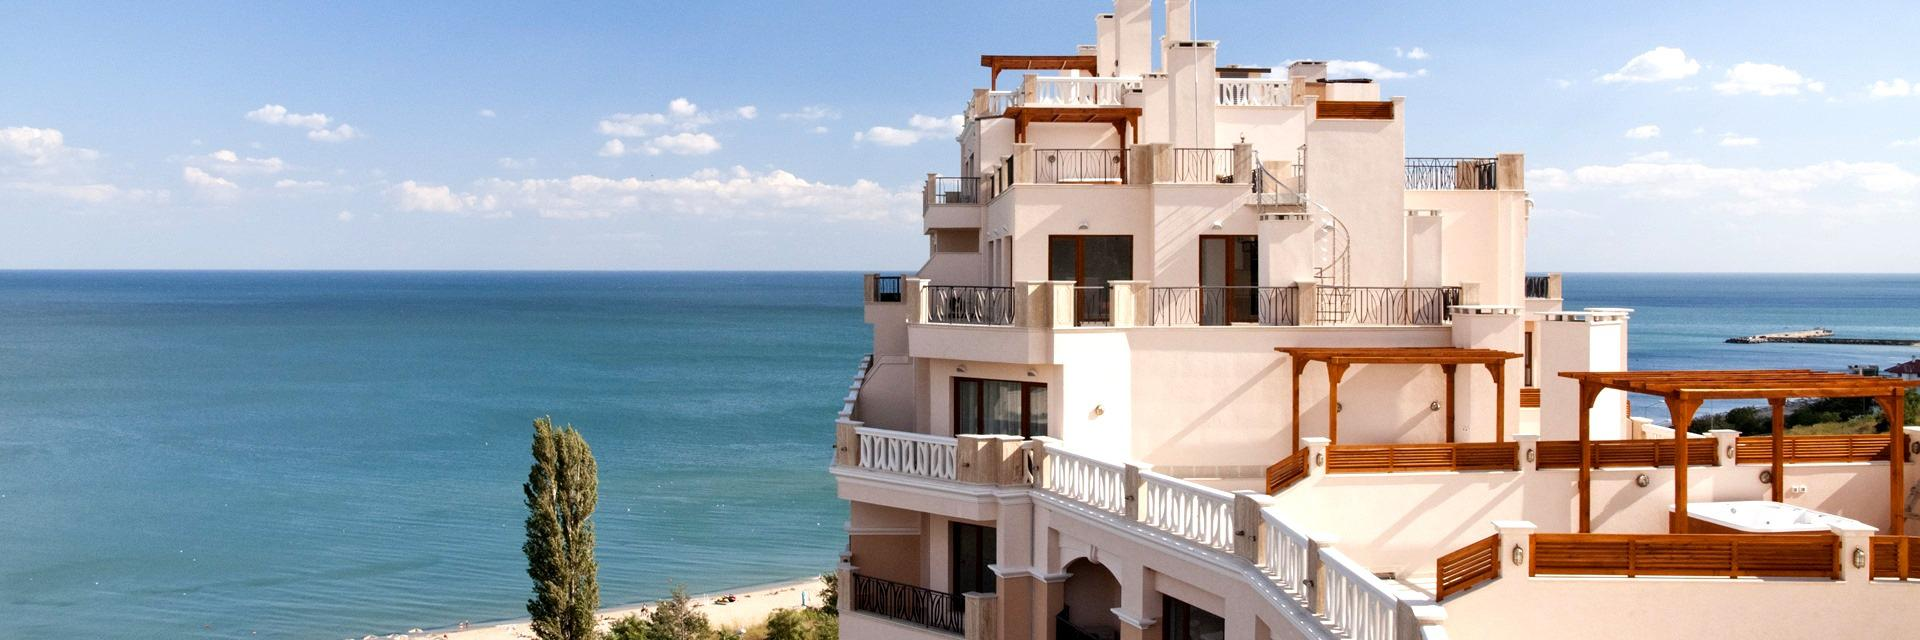 Exclusive two bedroom              beachfront apartment